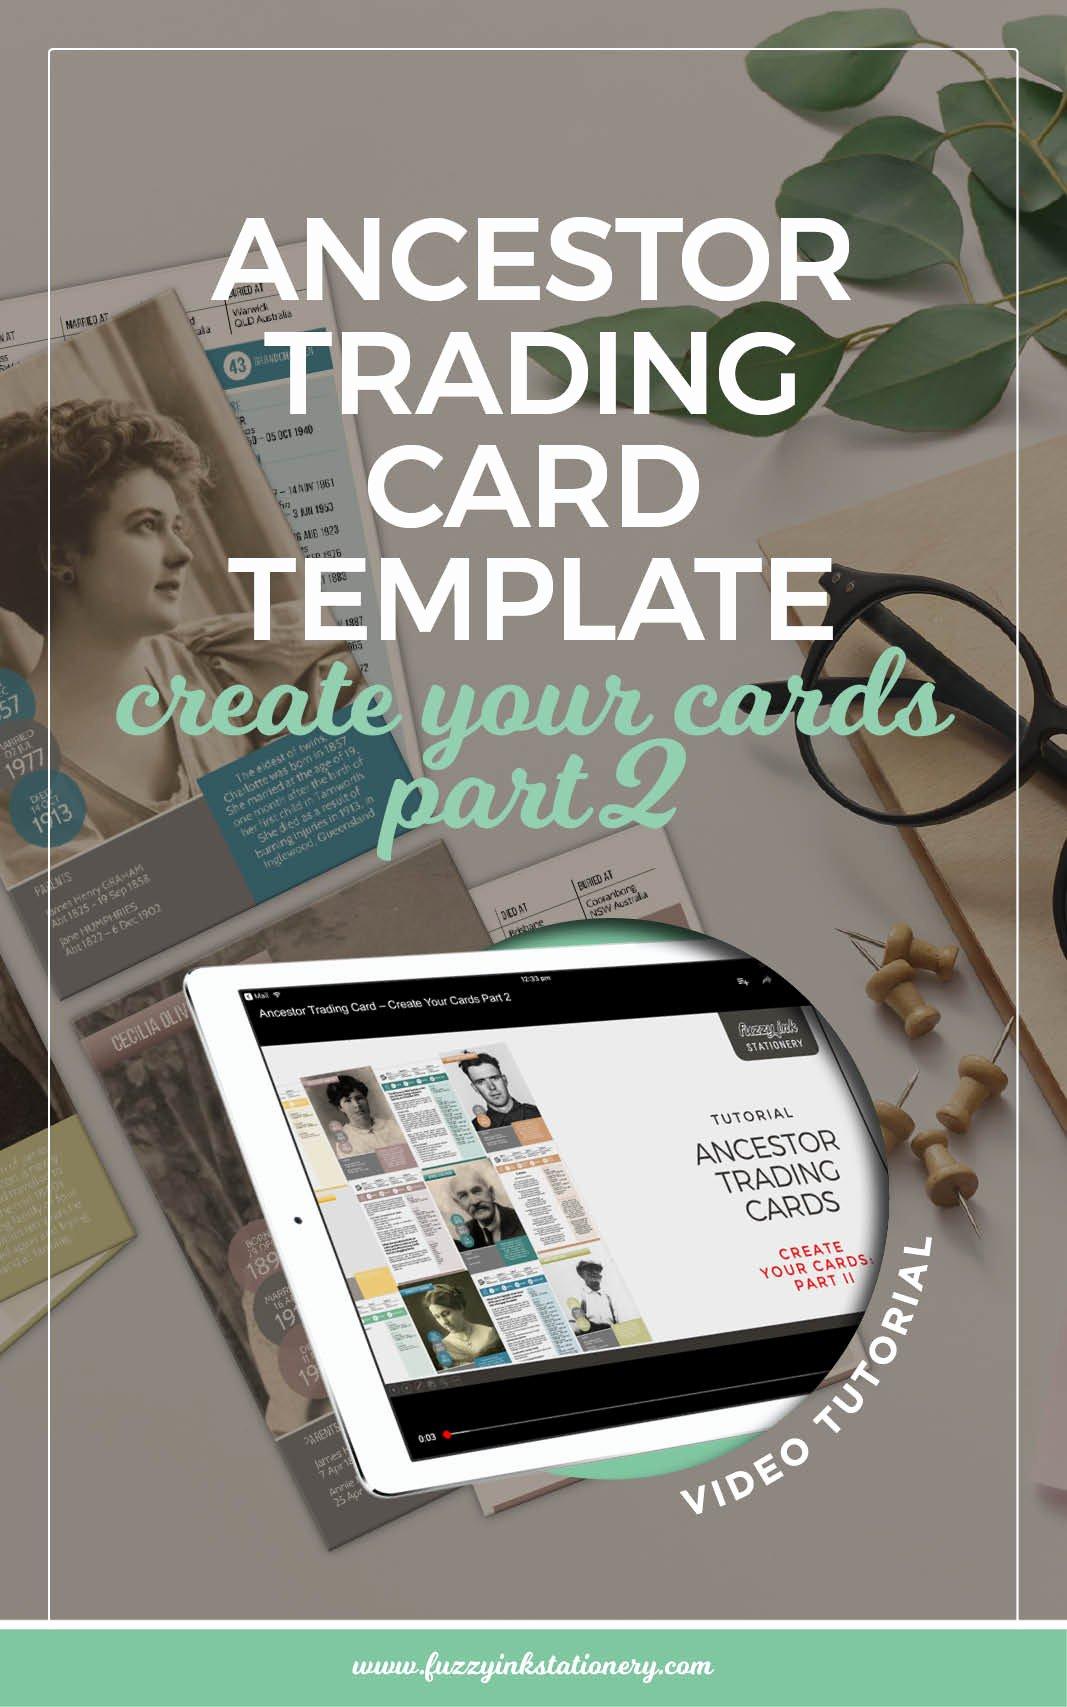 Trading Card Template Word Beautiful Ancestor Trading Card Template Create Your Cards Part 2